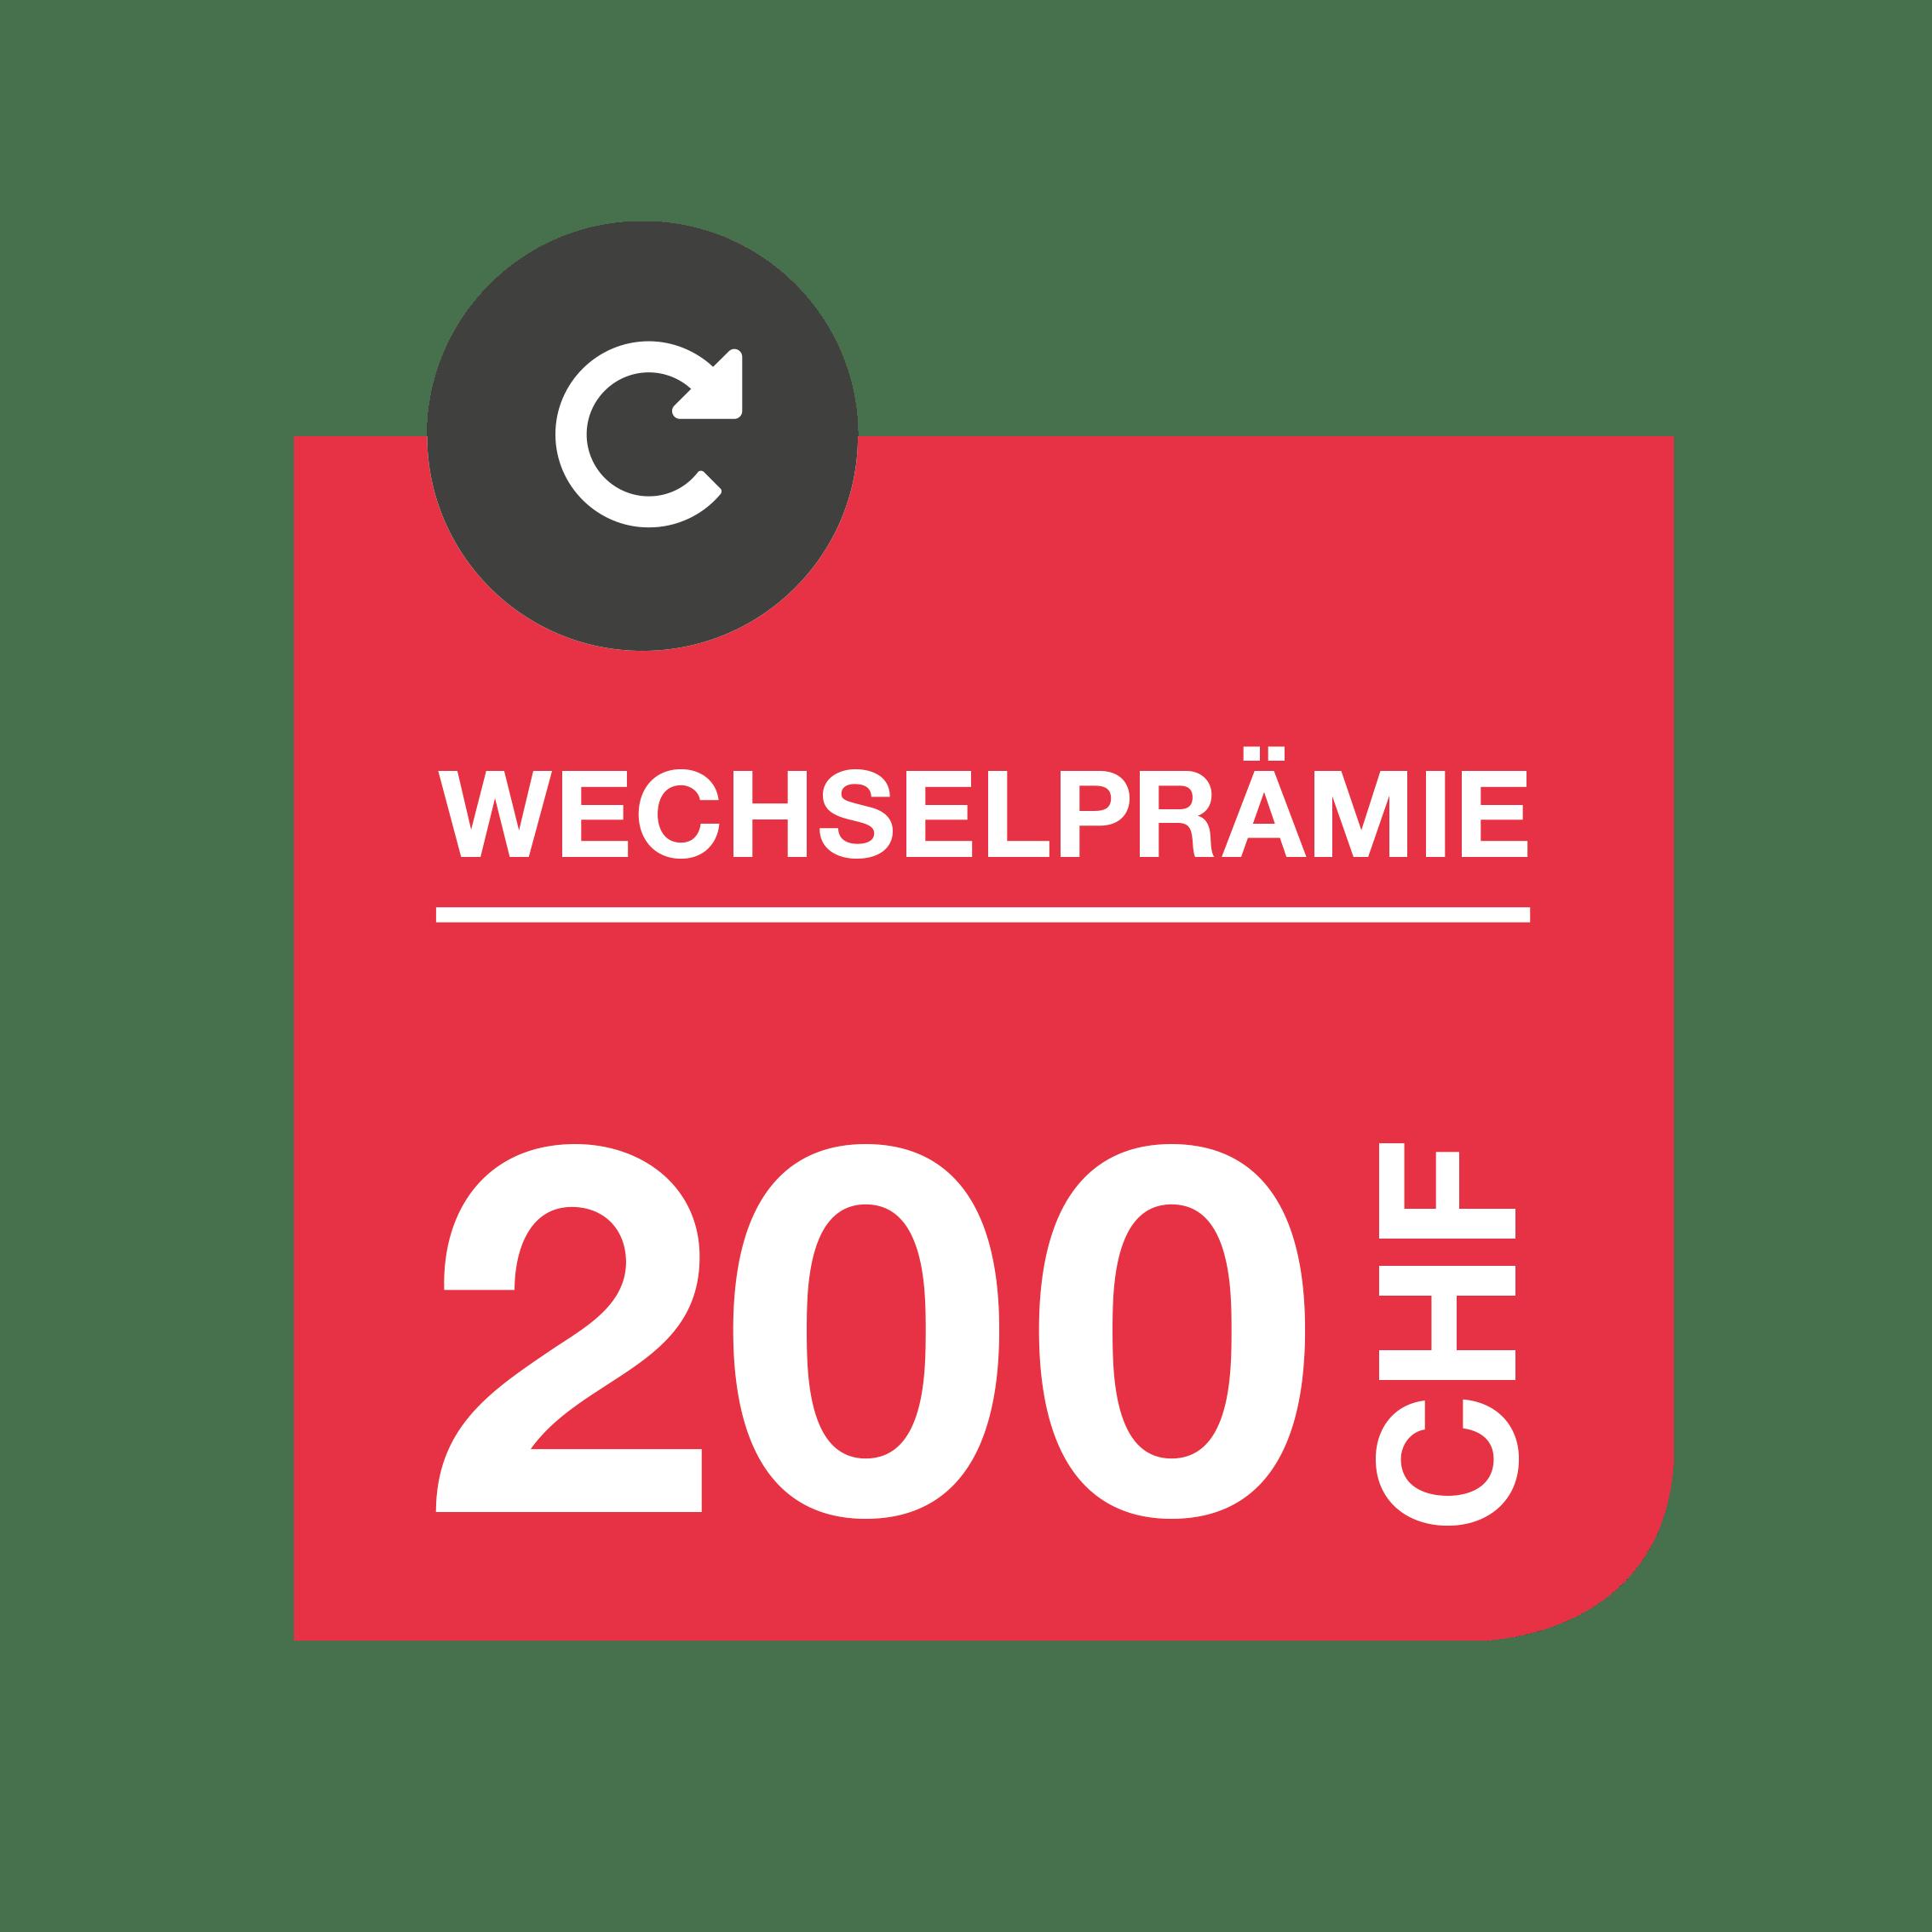 Wechselpraemie_200CHF_DE